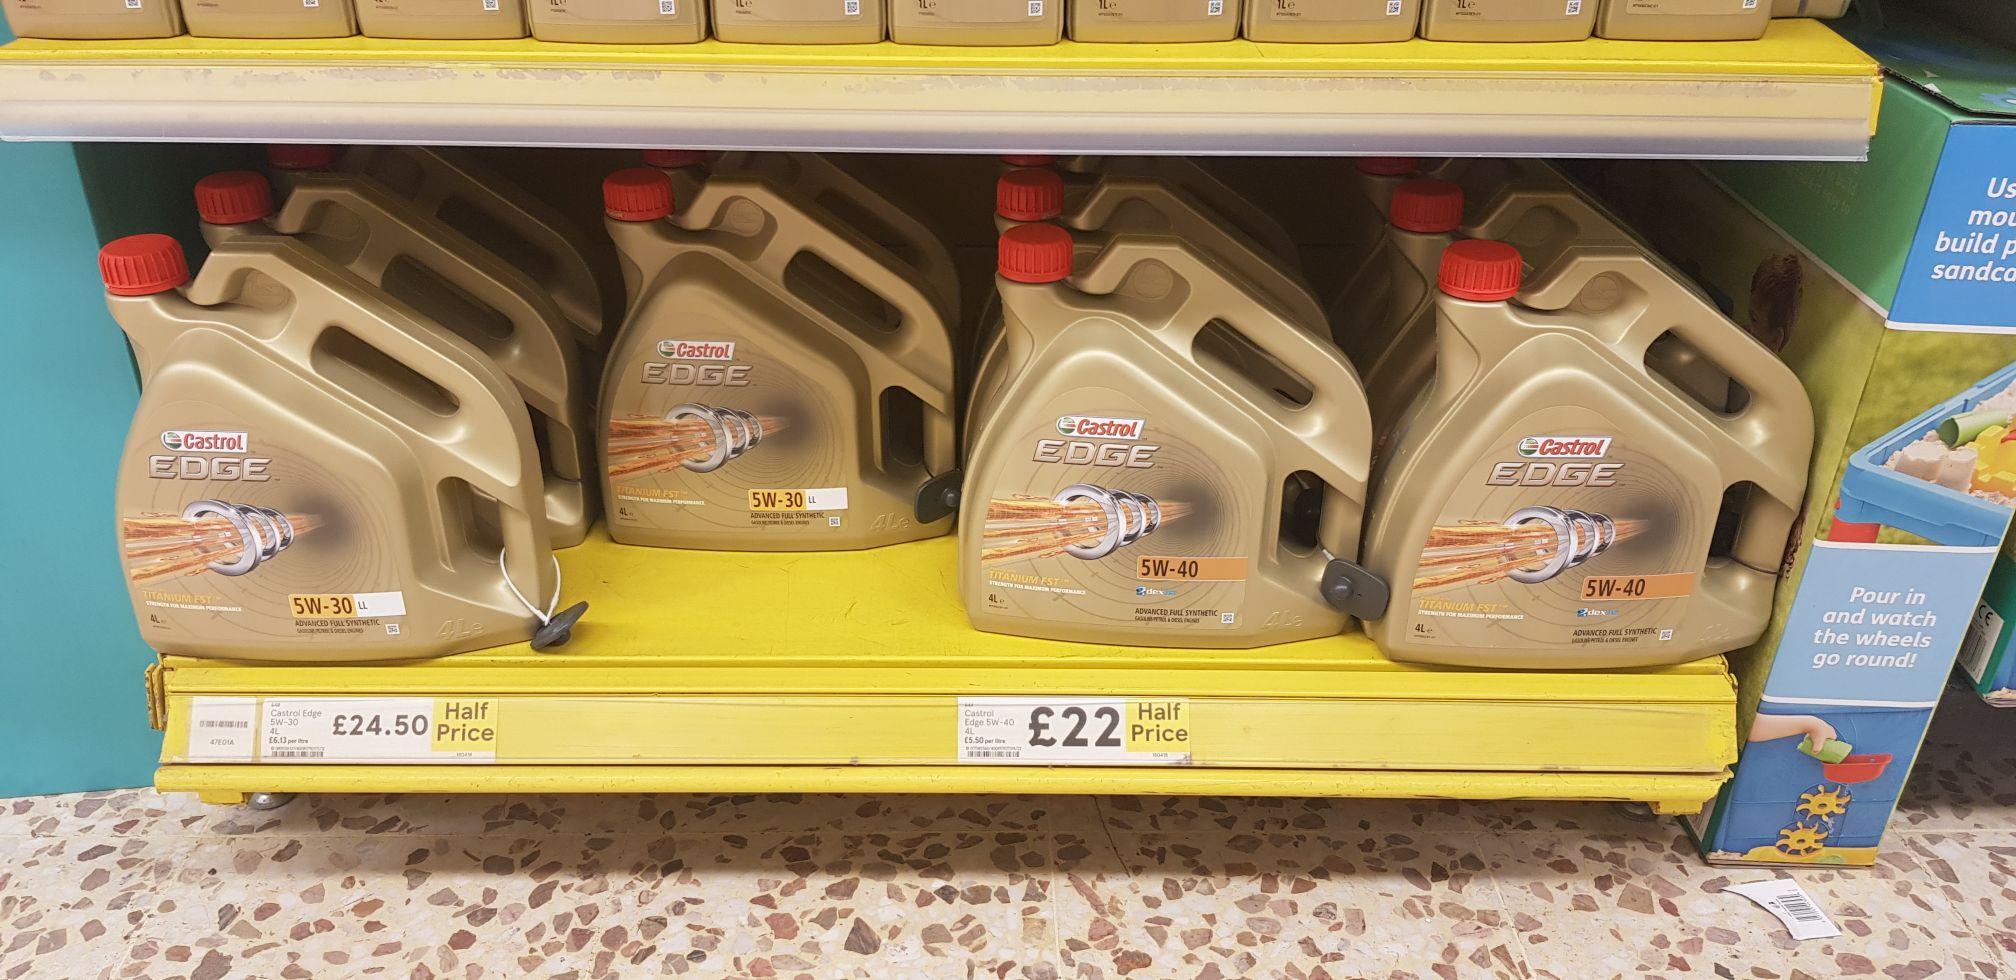 Castrol Edge 4l half price - £22 instore @ Tesco